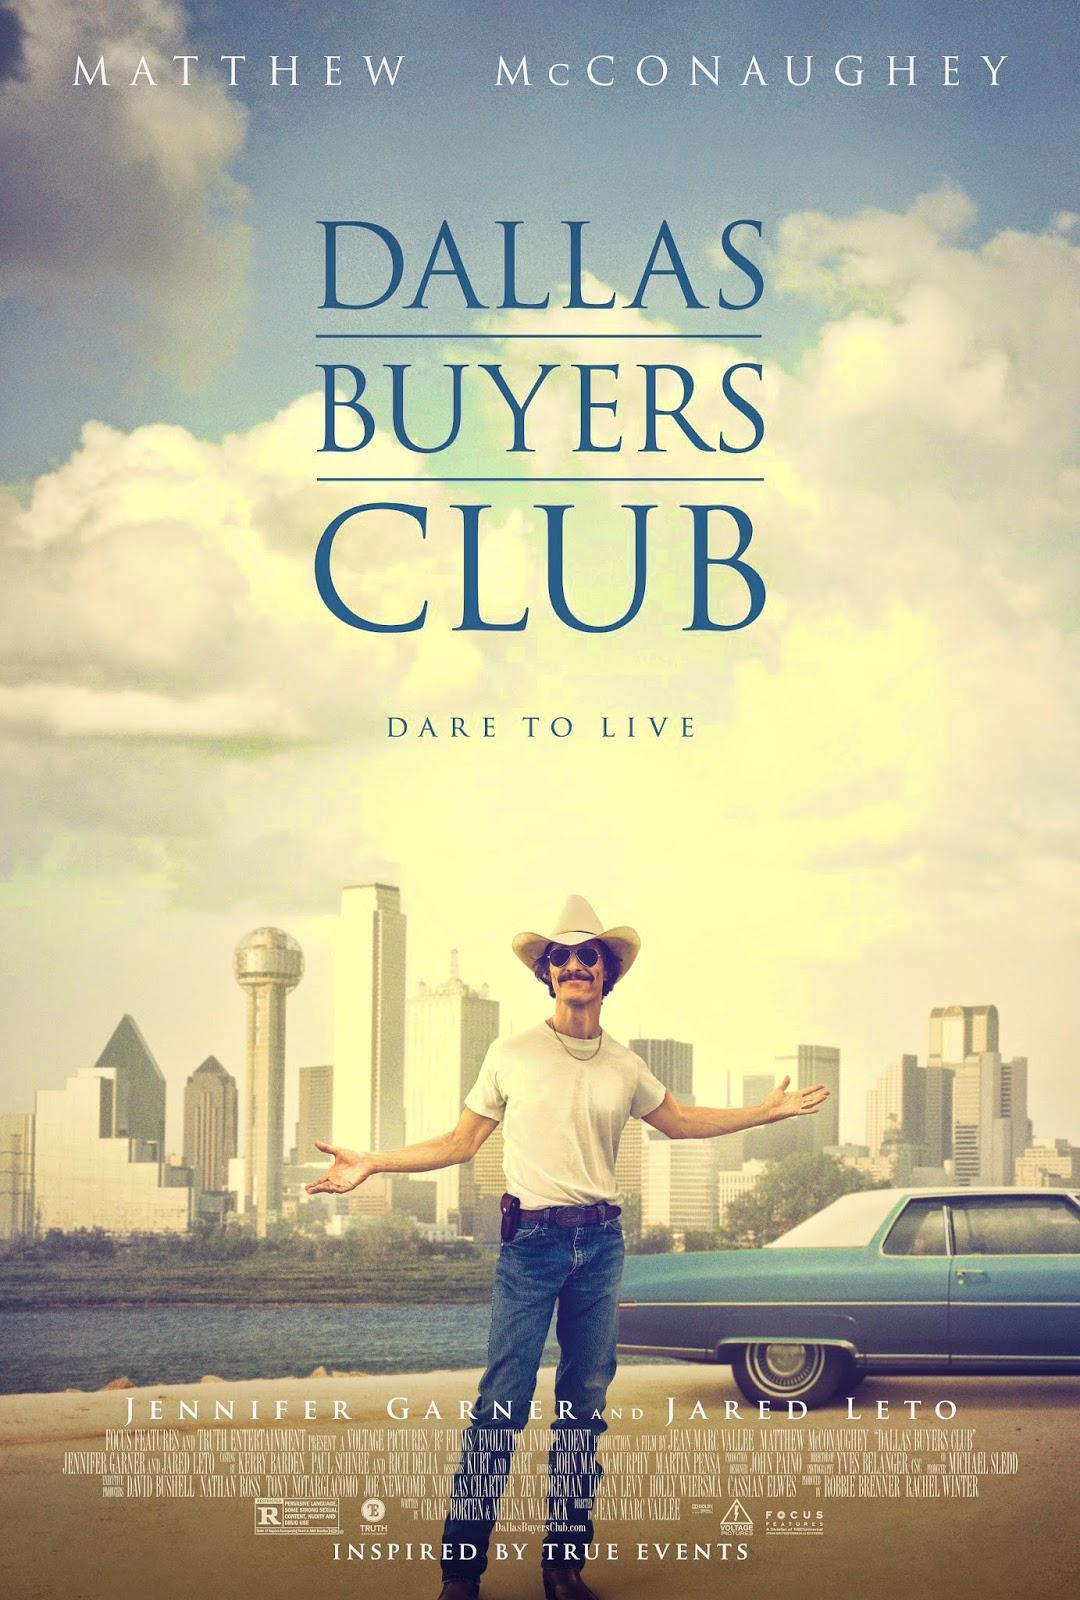 http://culture21century.blogspot.gr/2014/06/dallas-buyers-club.html